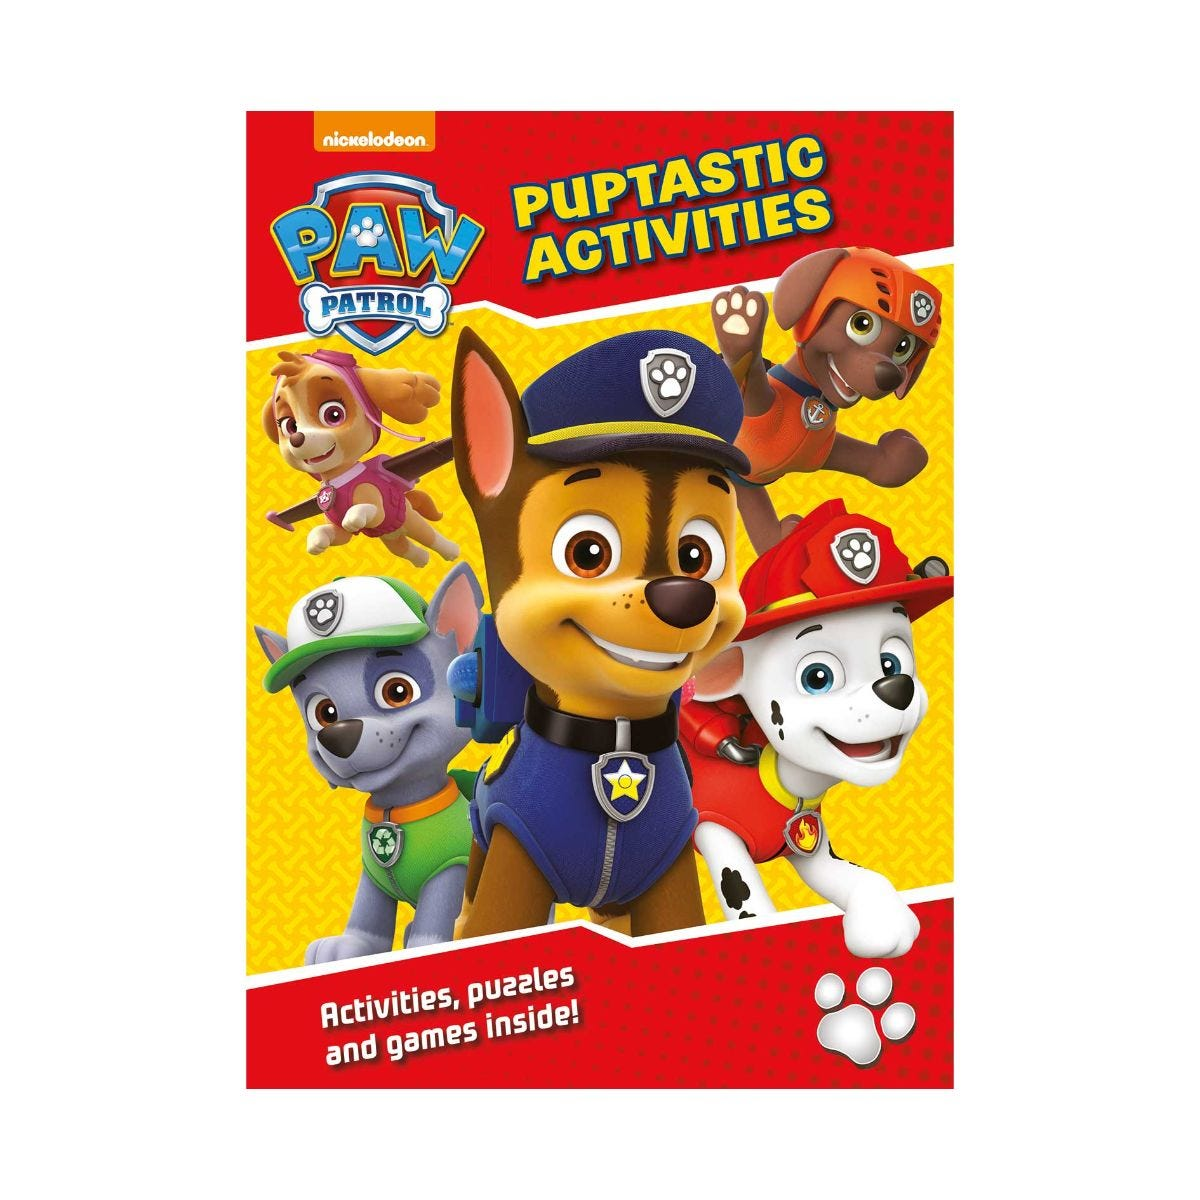 paw patrol puptastic activities book price